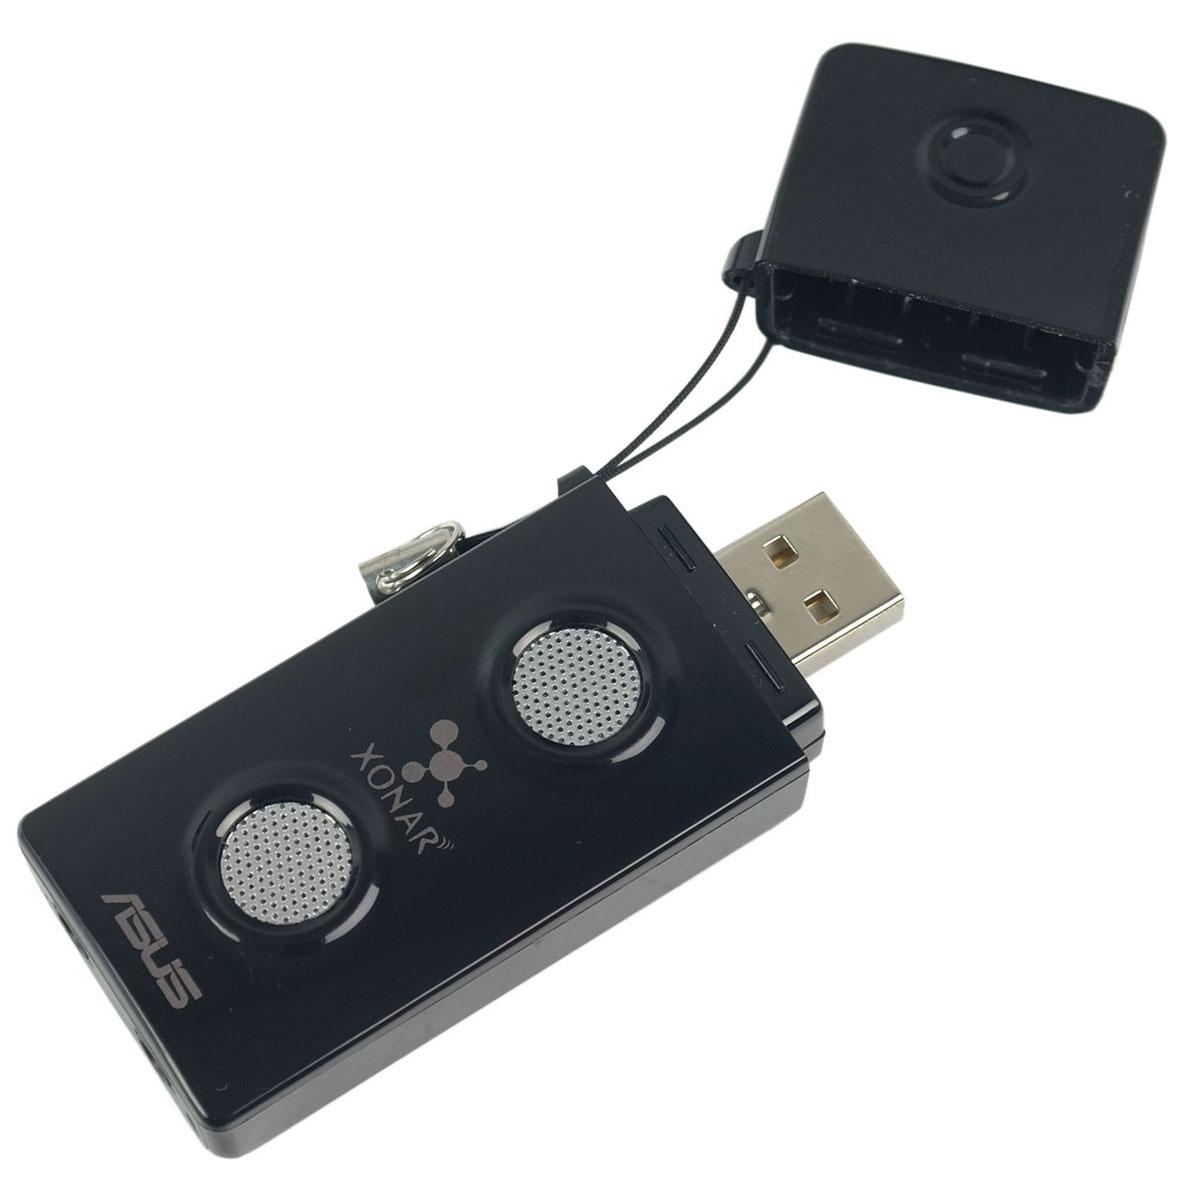 Asus Xonar U3 звуковая карта ( XONAR U3 )